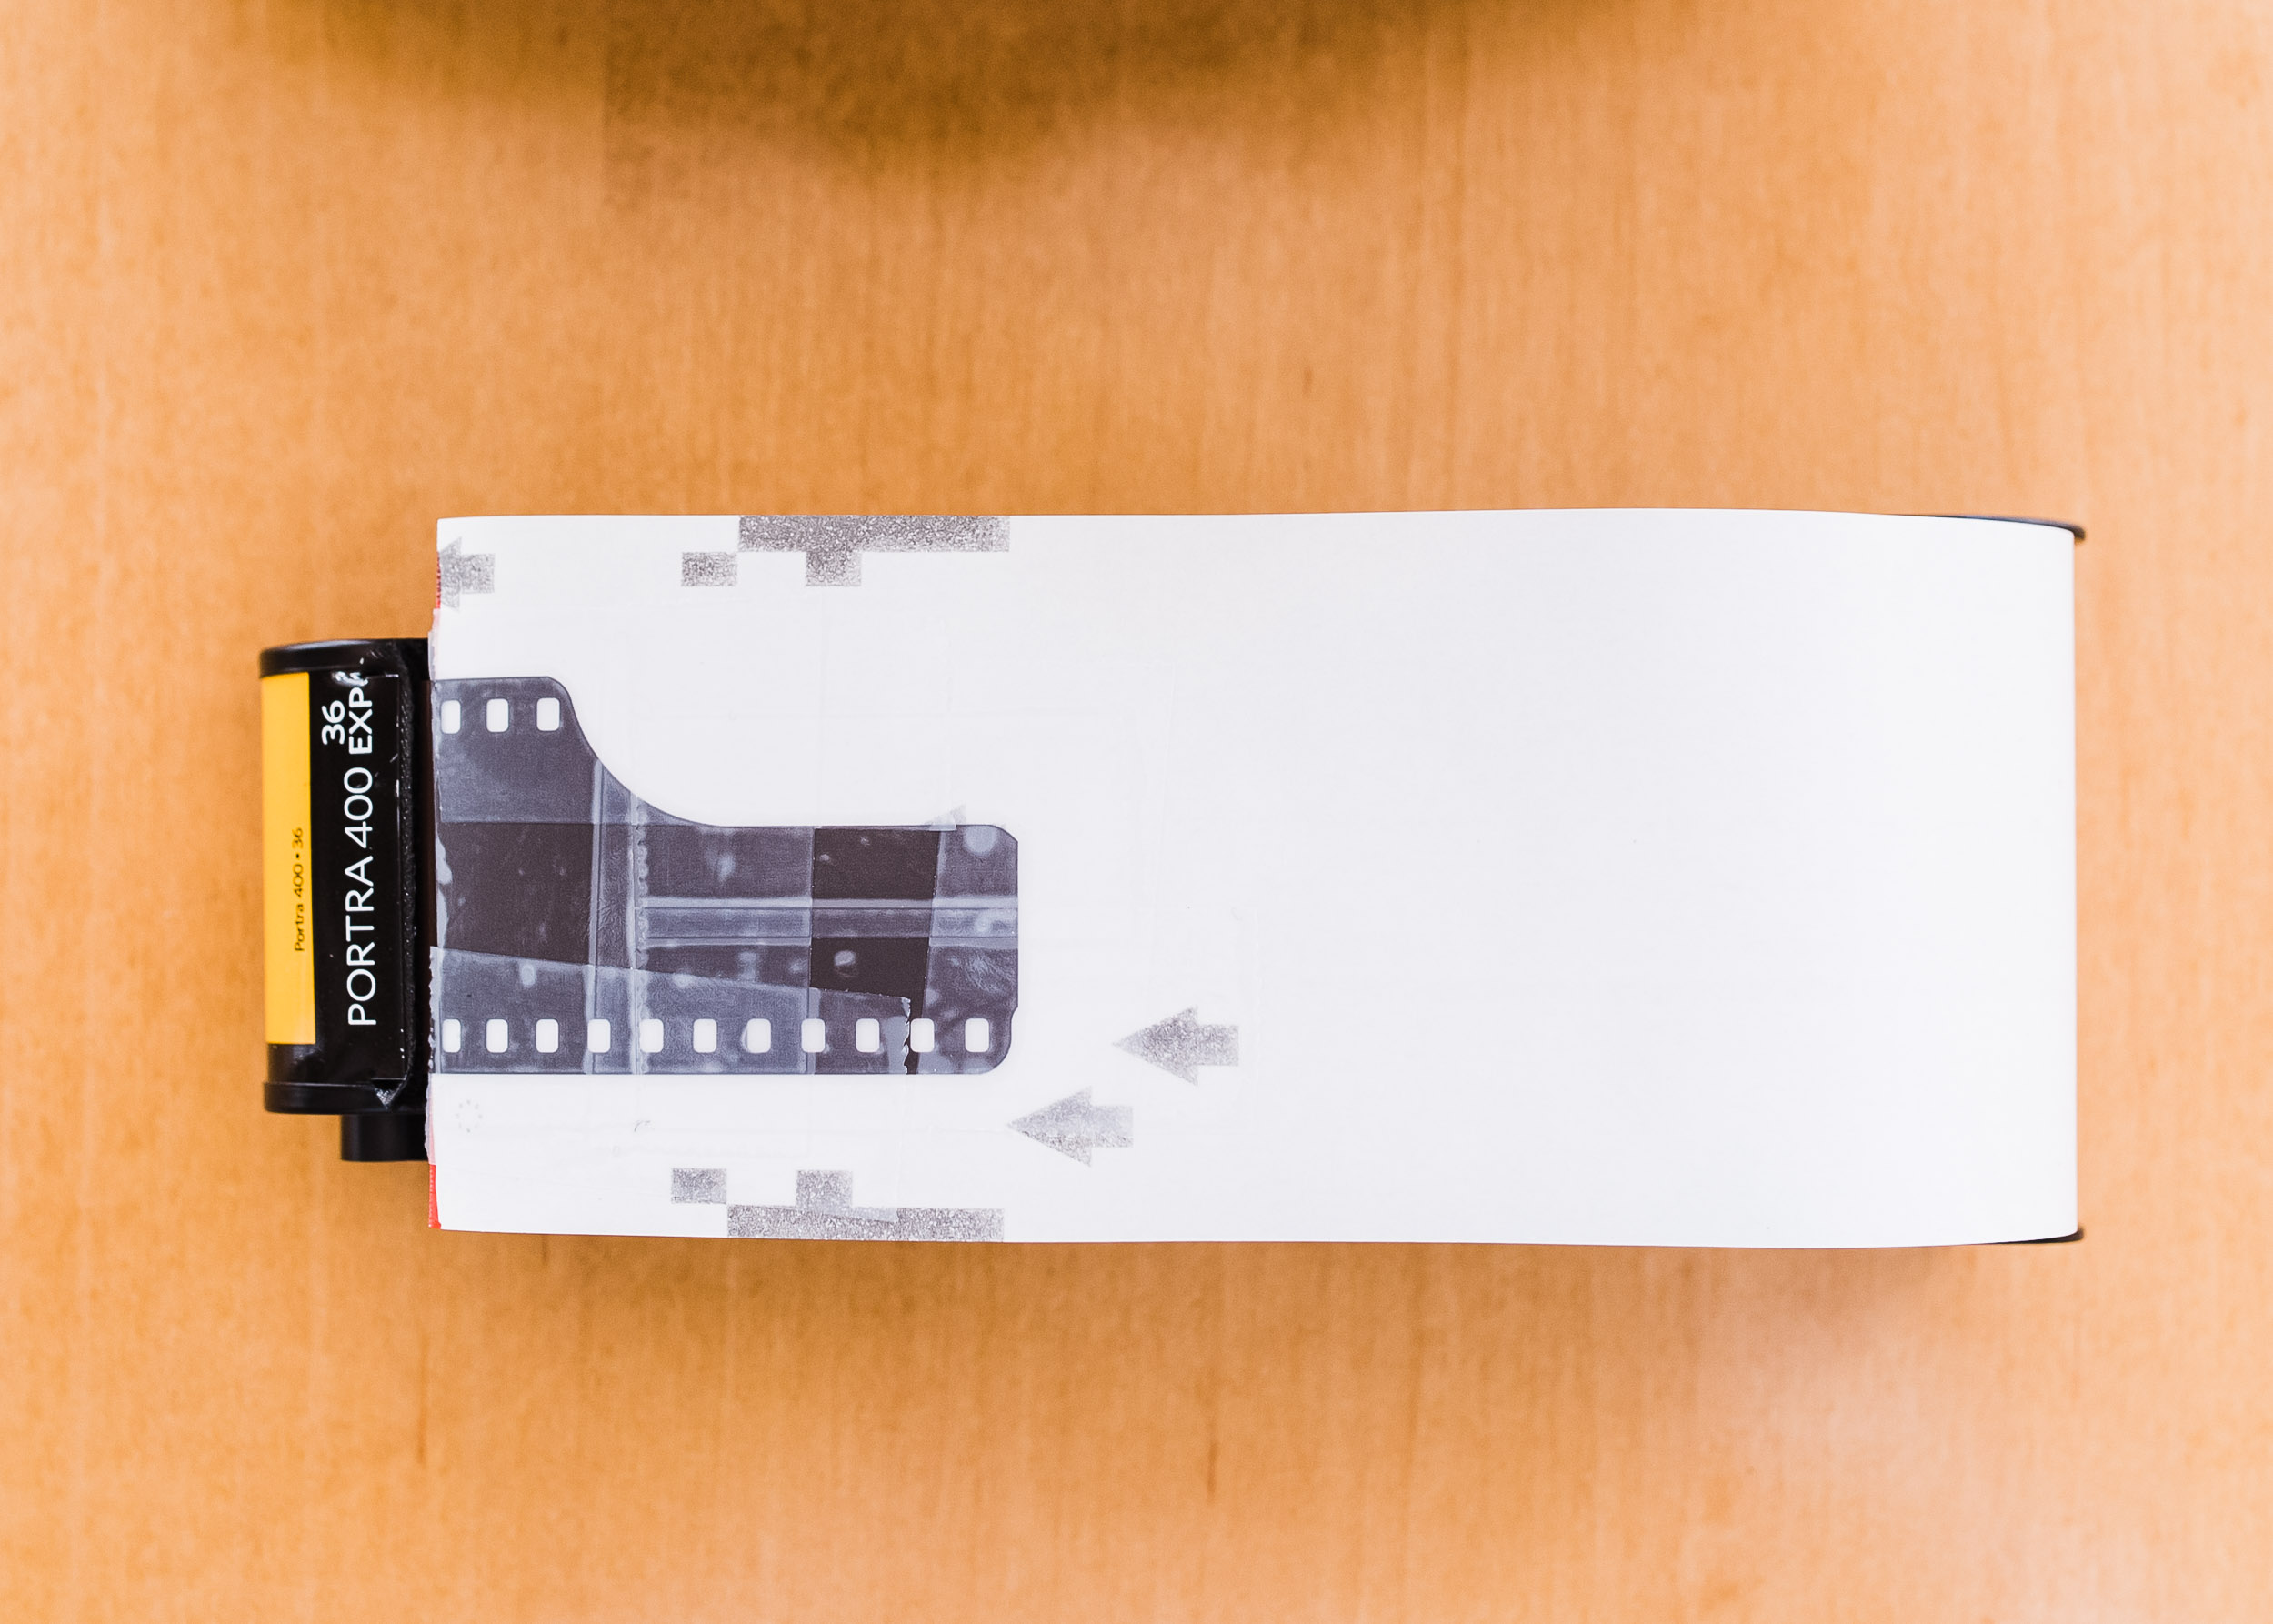 Pentax 67 35mm panorama step 4